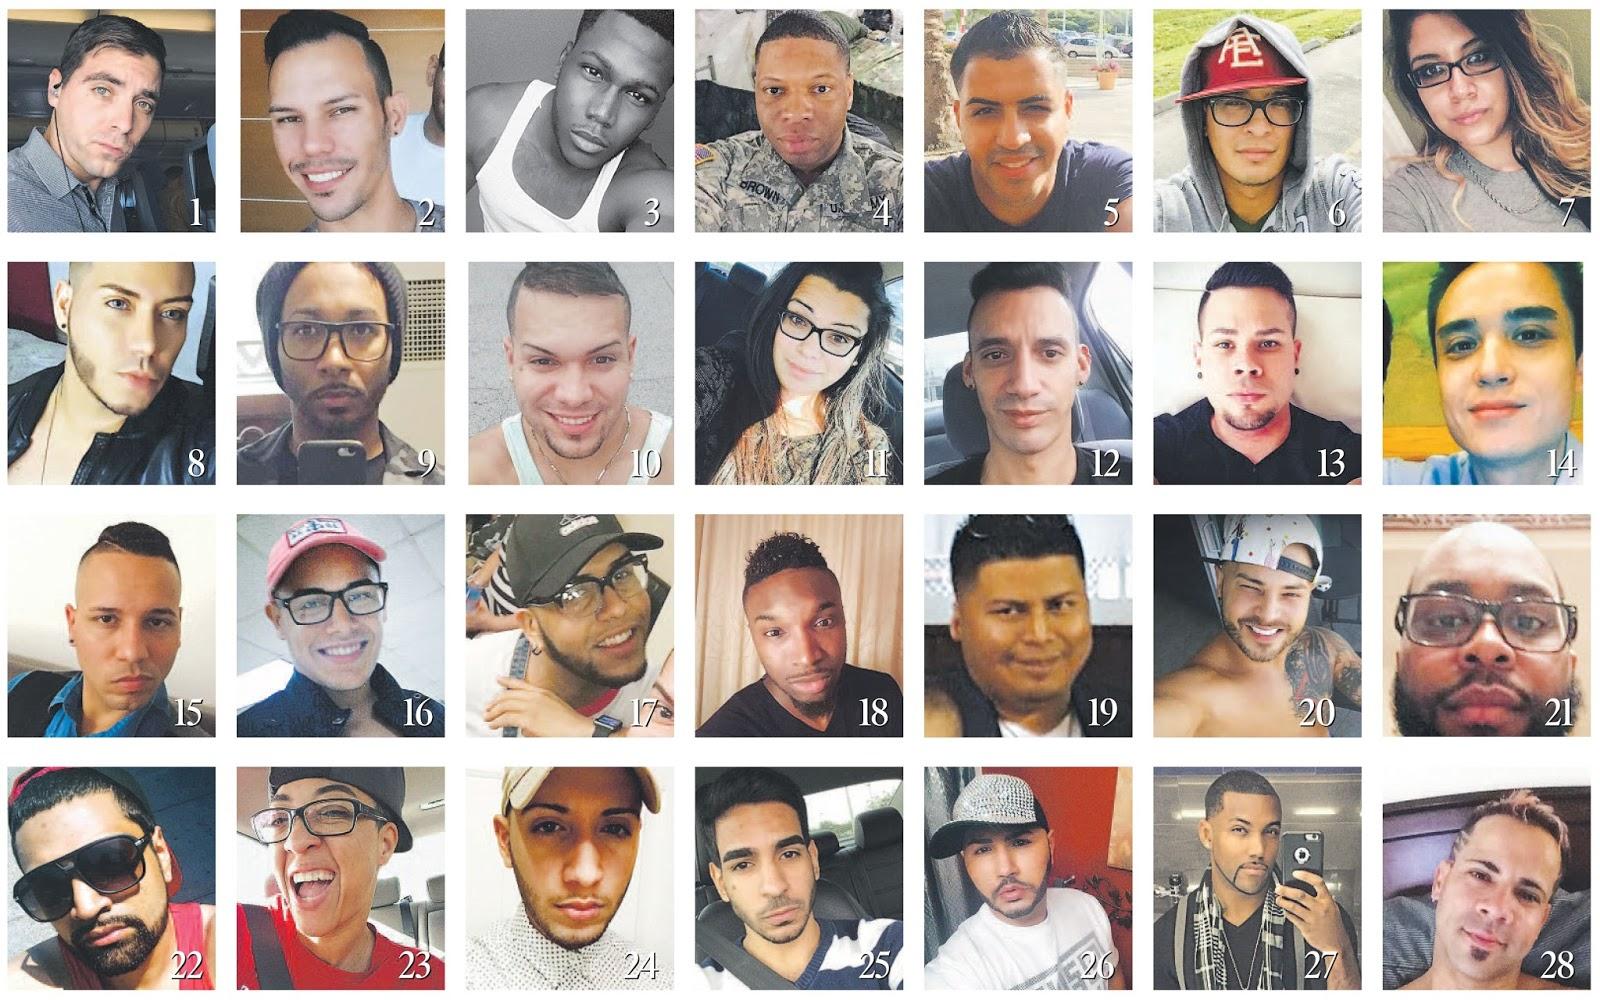 Orlando victims, 4